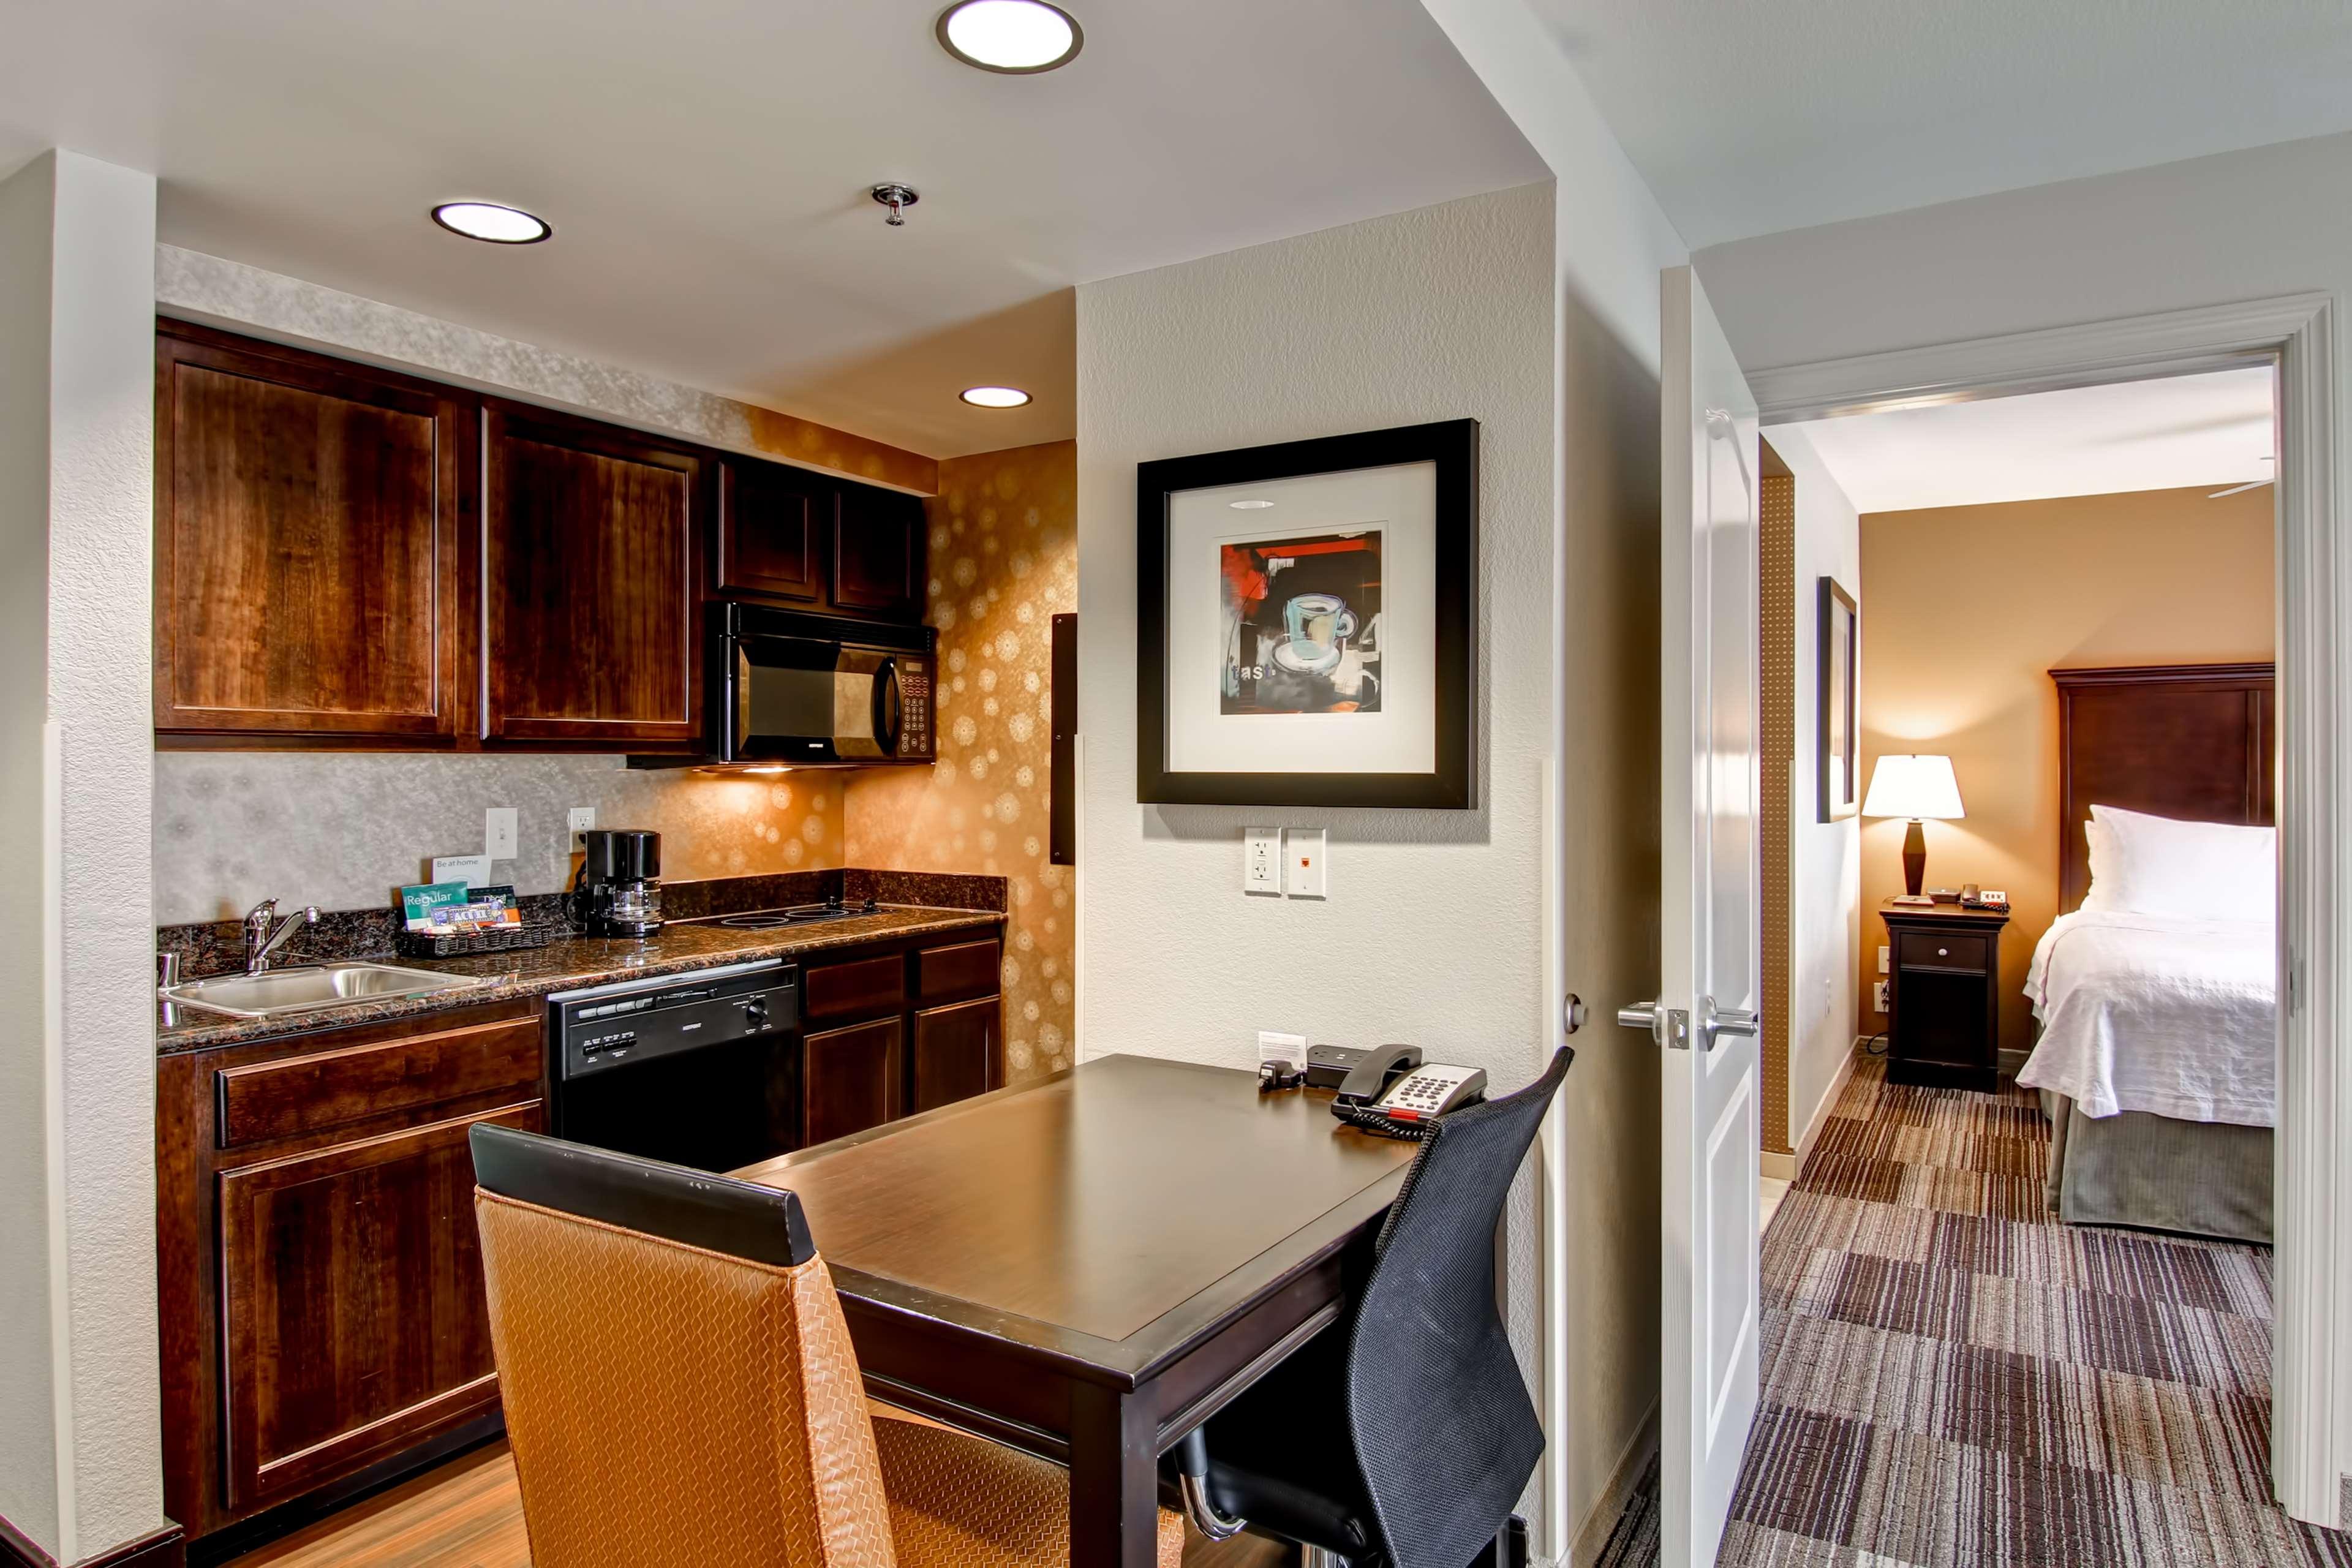 Homewood Suites by Hilton Cincinnati Airport South-Florence image 24